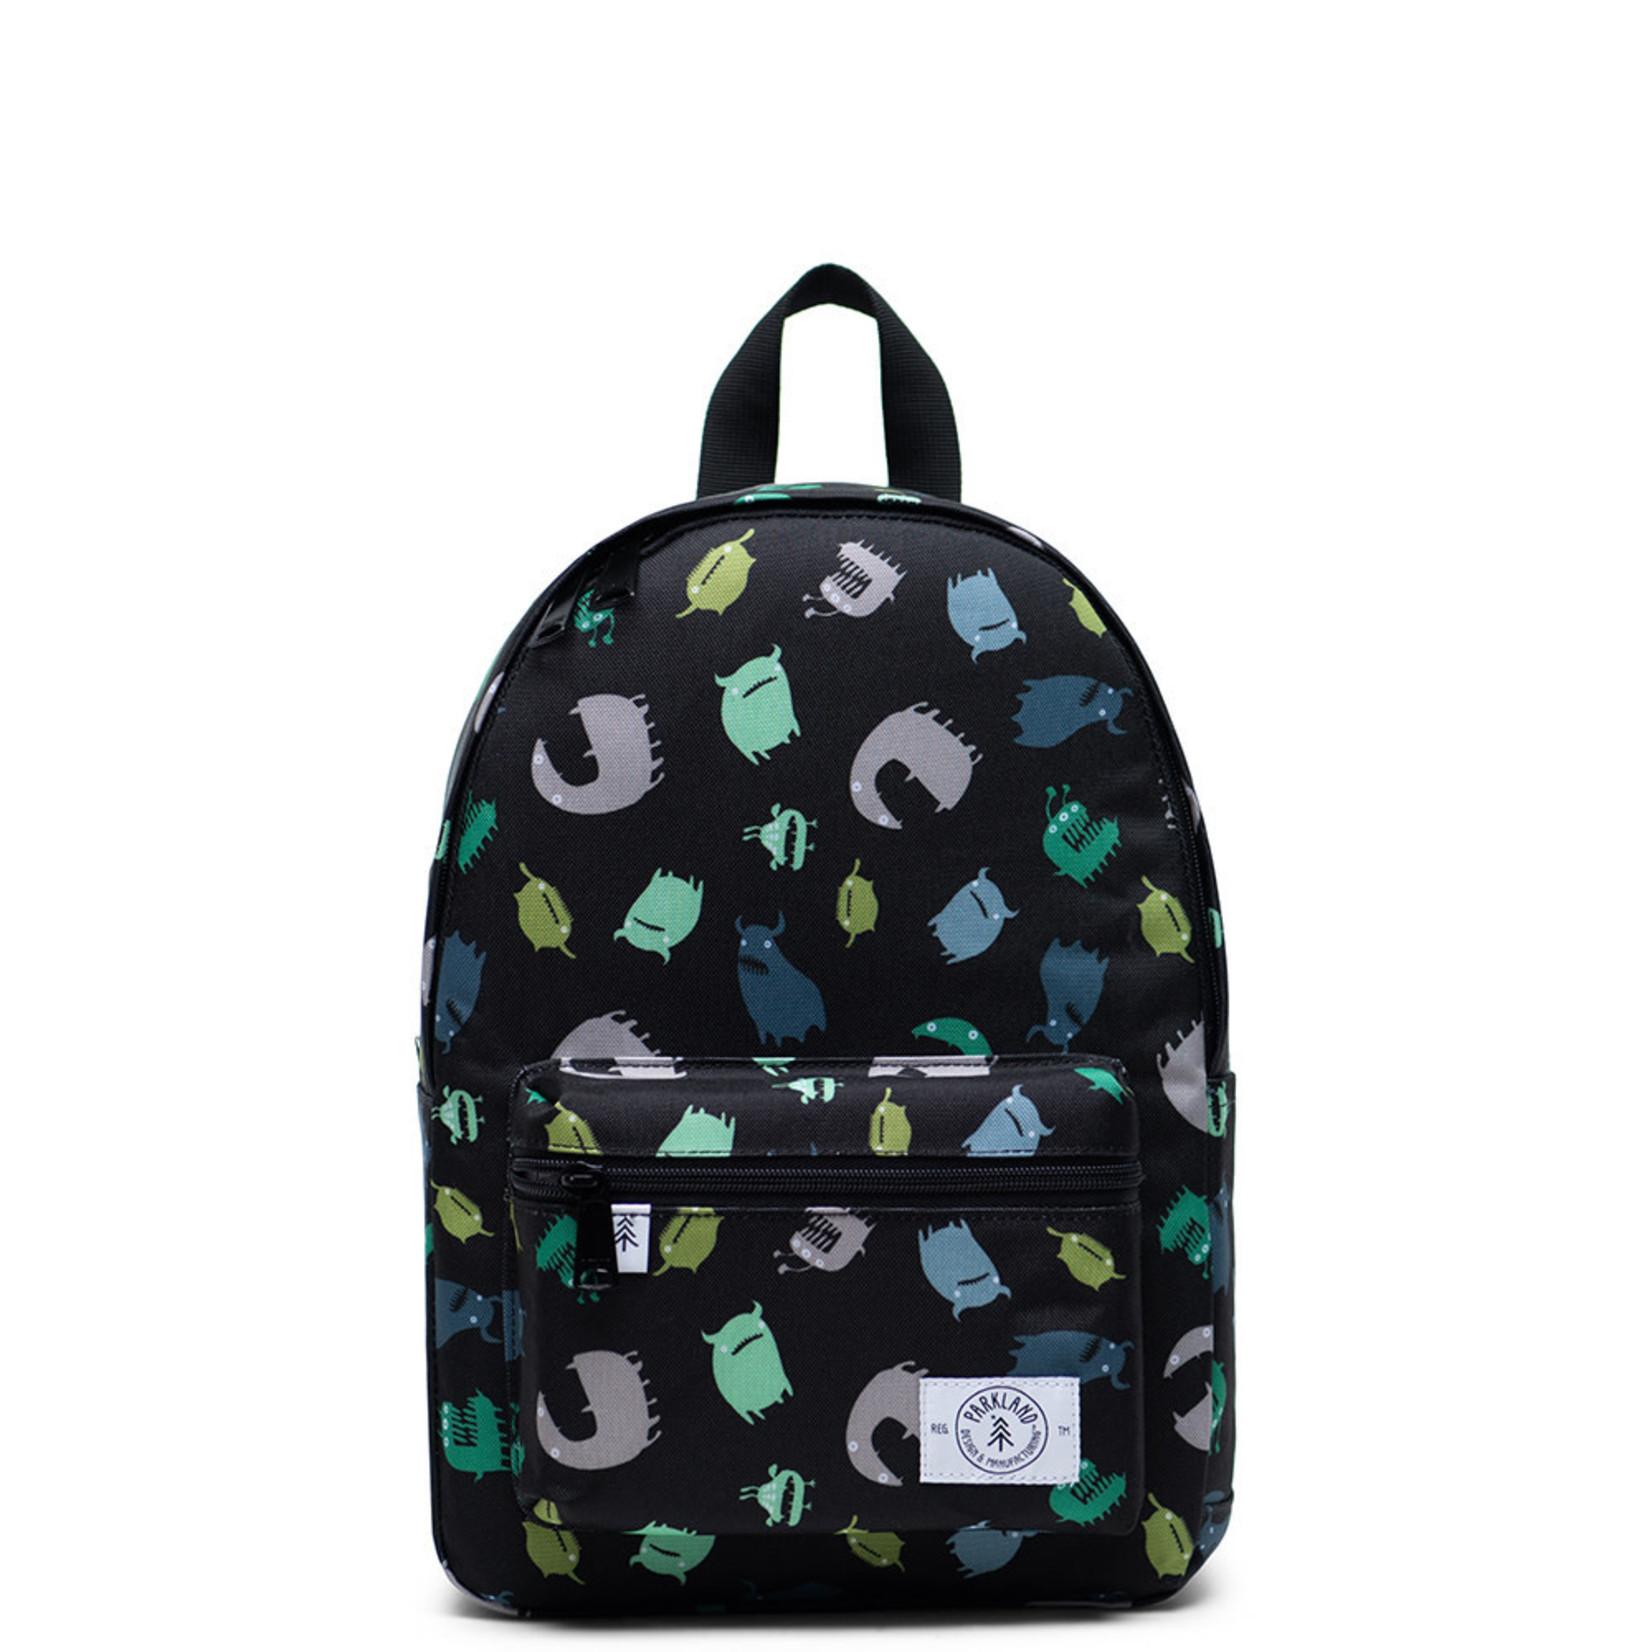 PARKLAND PARKLAND backpack Edison critters